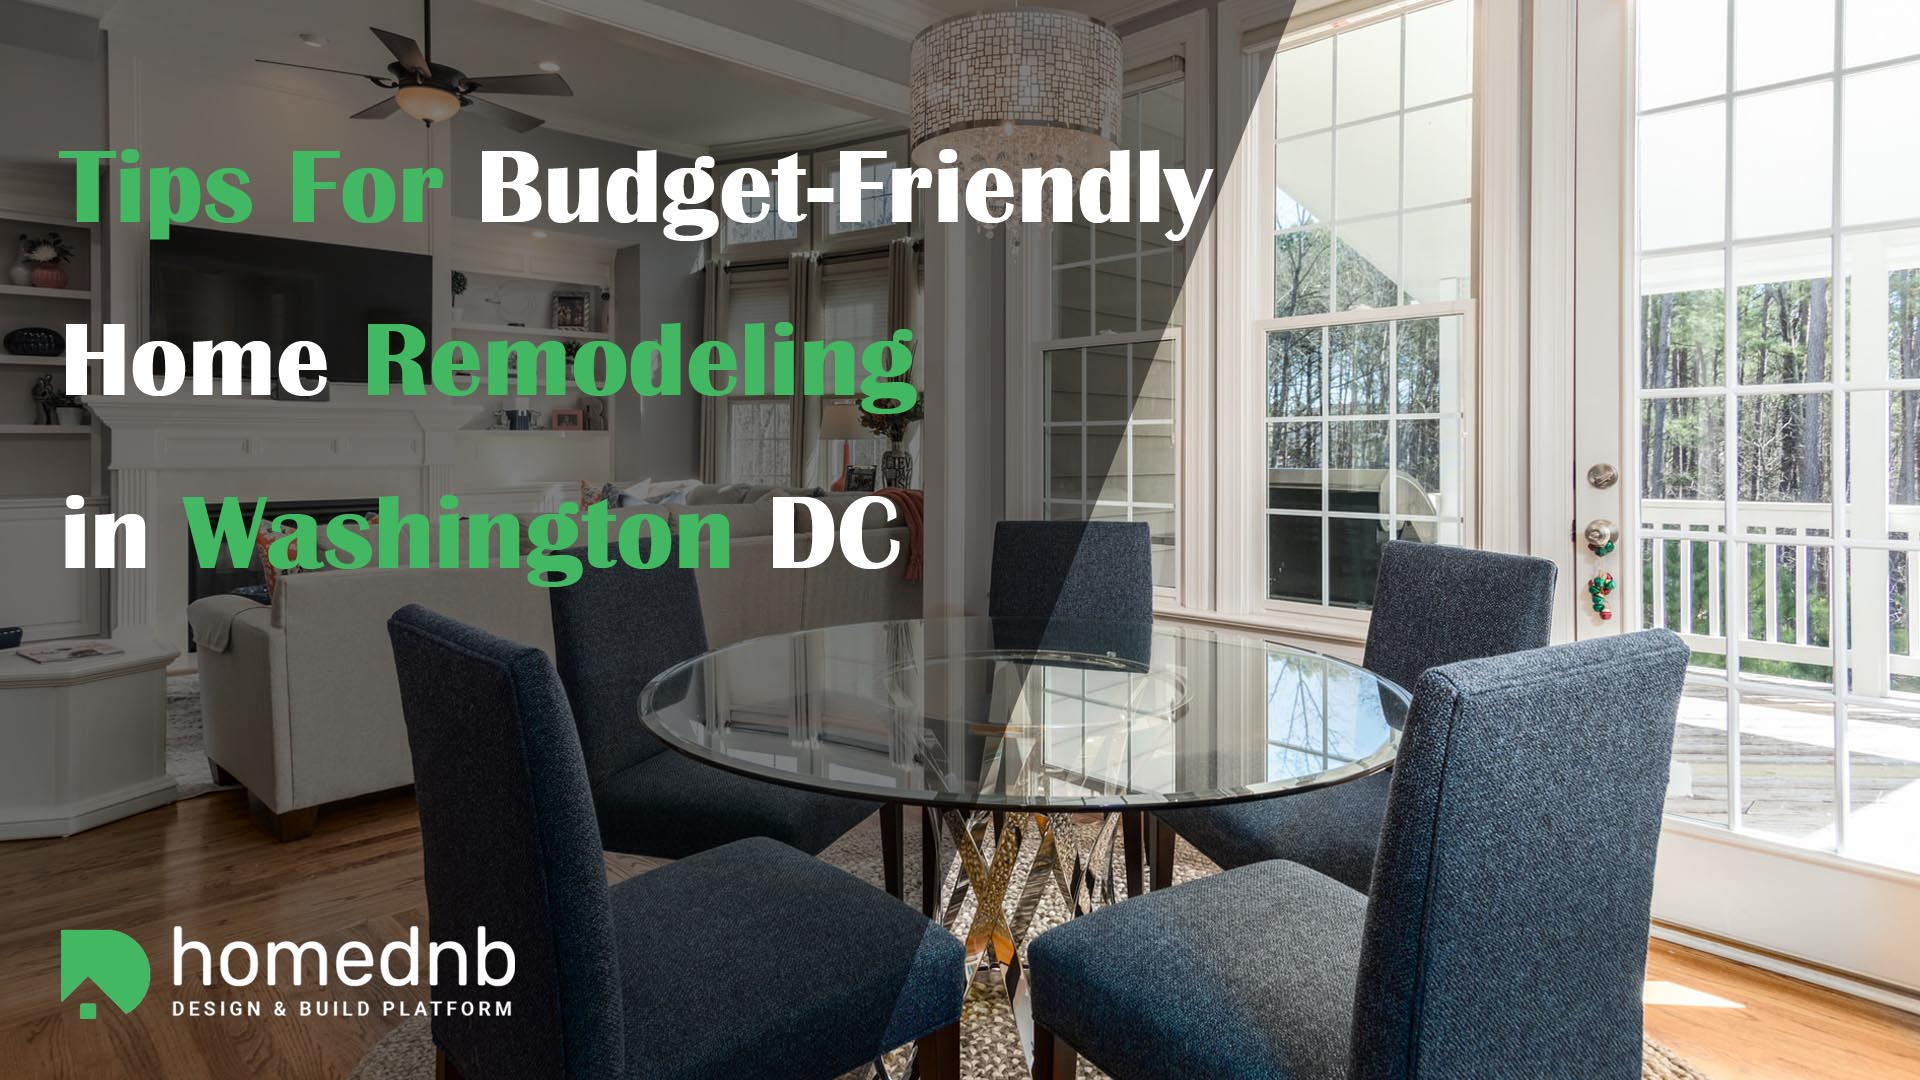 Home Remodeling Washington DC